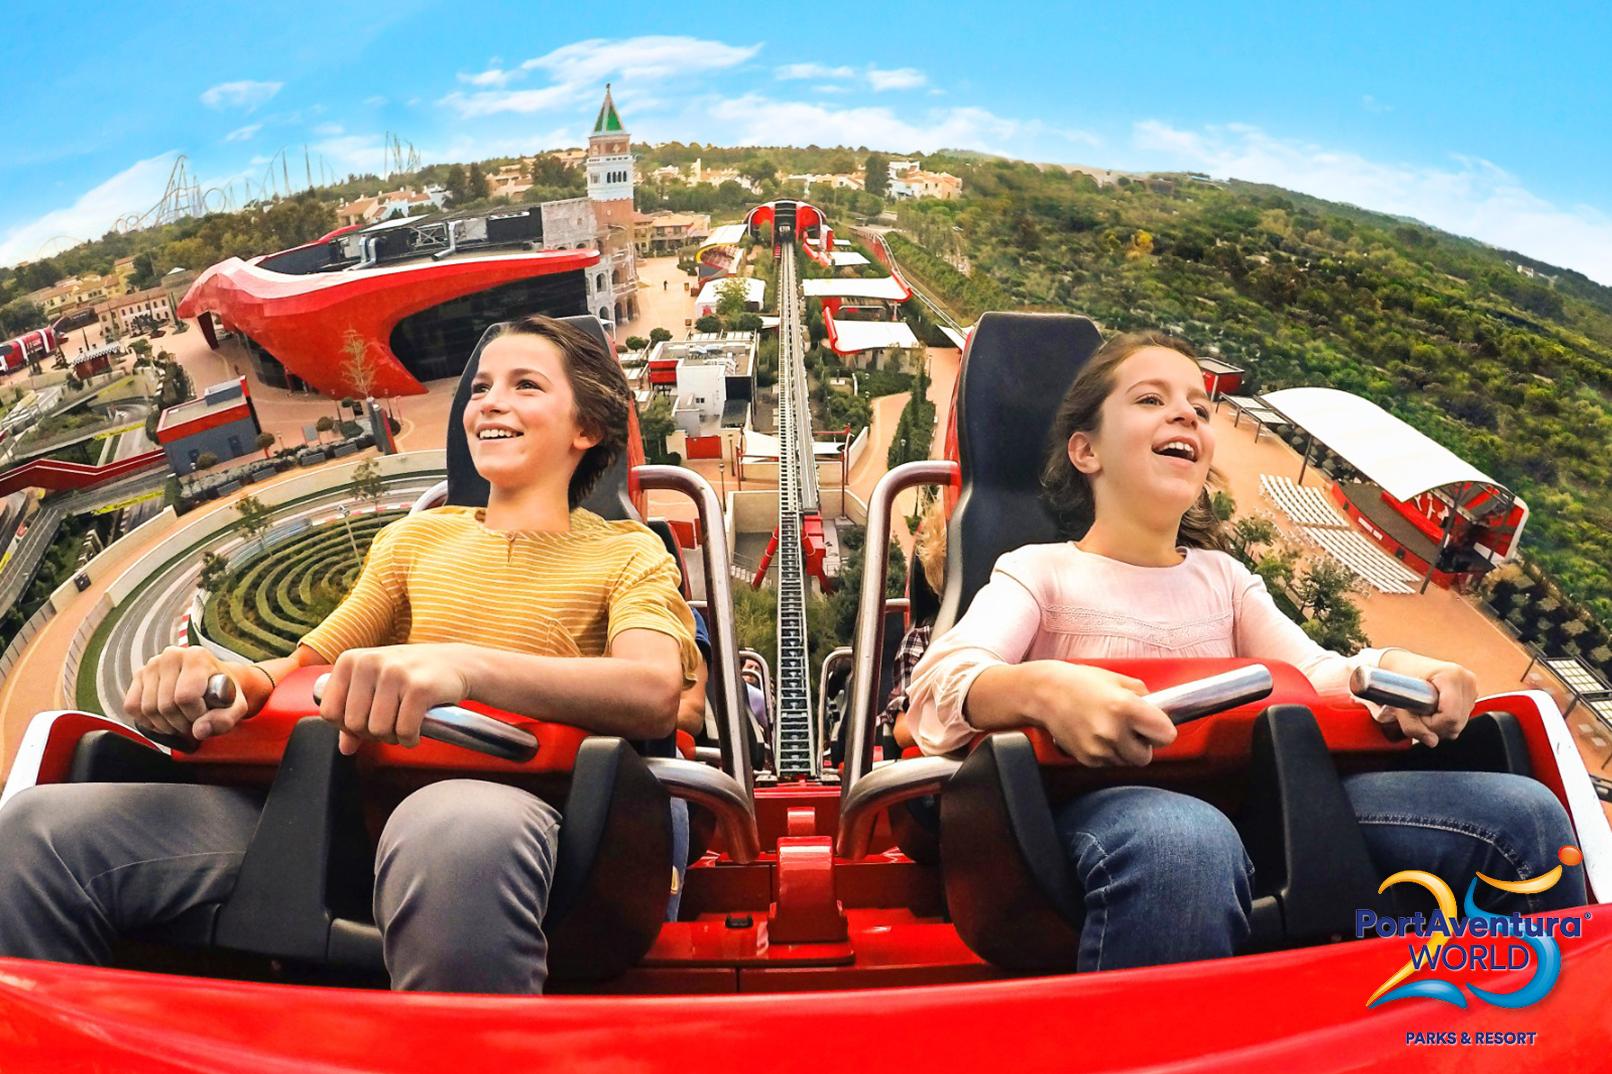 A ride in Ferrari World, PortAventura